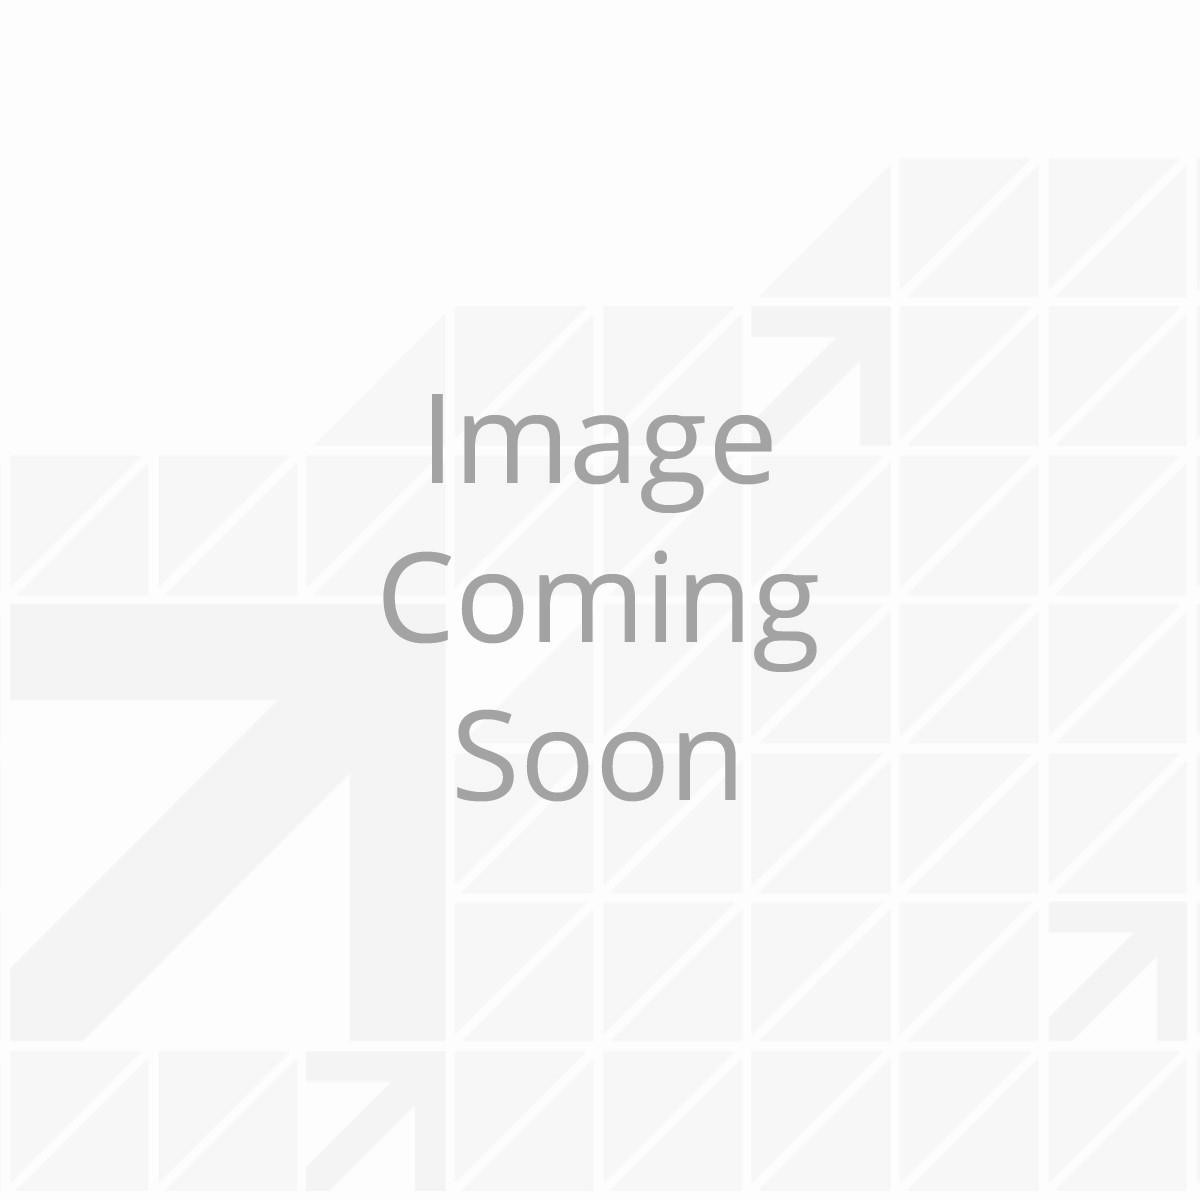 5121 ALPHATHANE 100% Solids Self-Leveling Sealant, White (9.8 Oz. Tube)